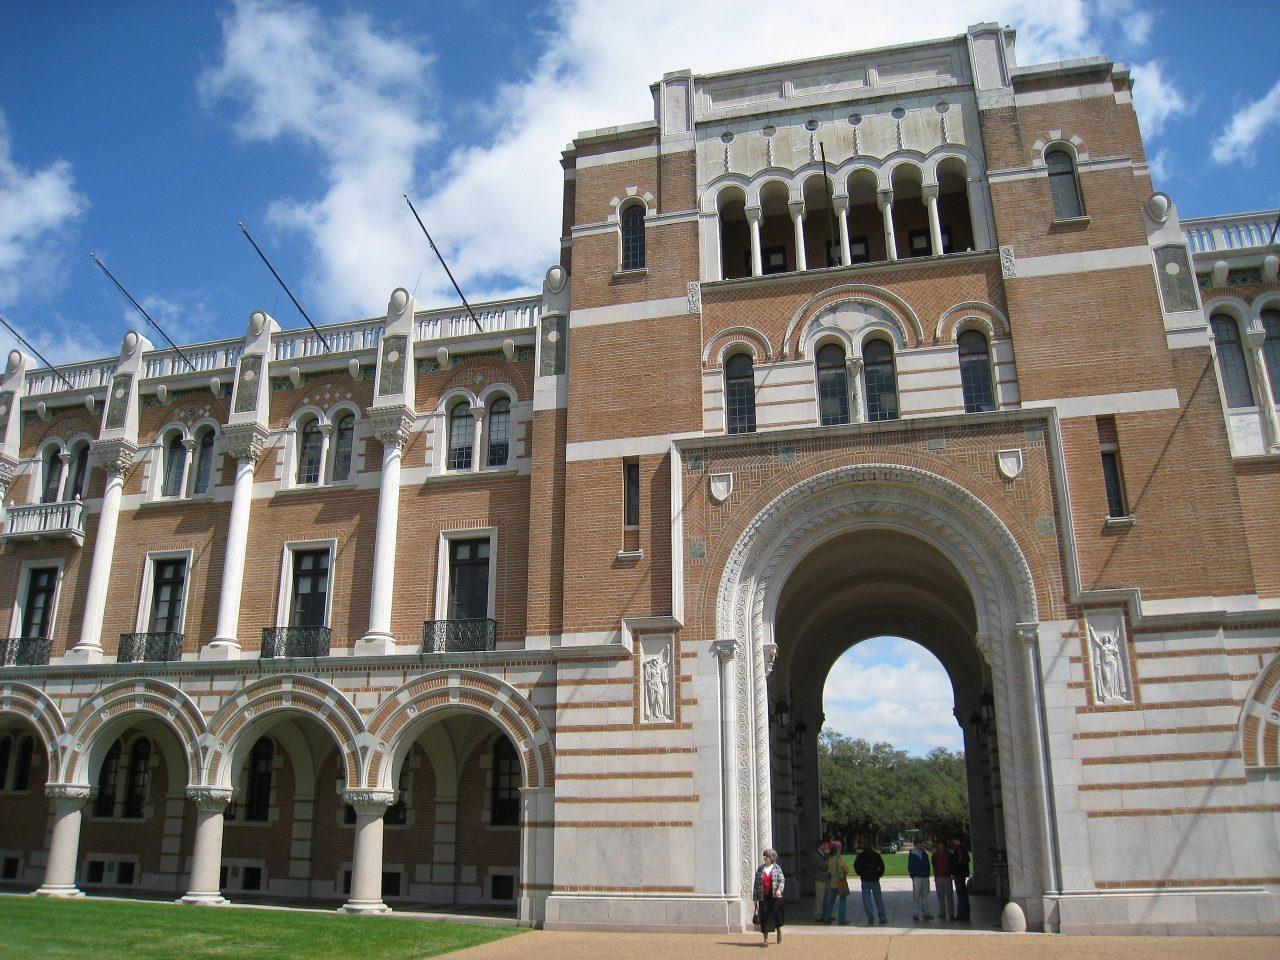 https://thetexan.news/wp-content/uploads/2021/09/Rice-University-1280x960.jpg